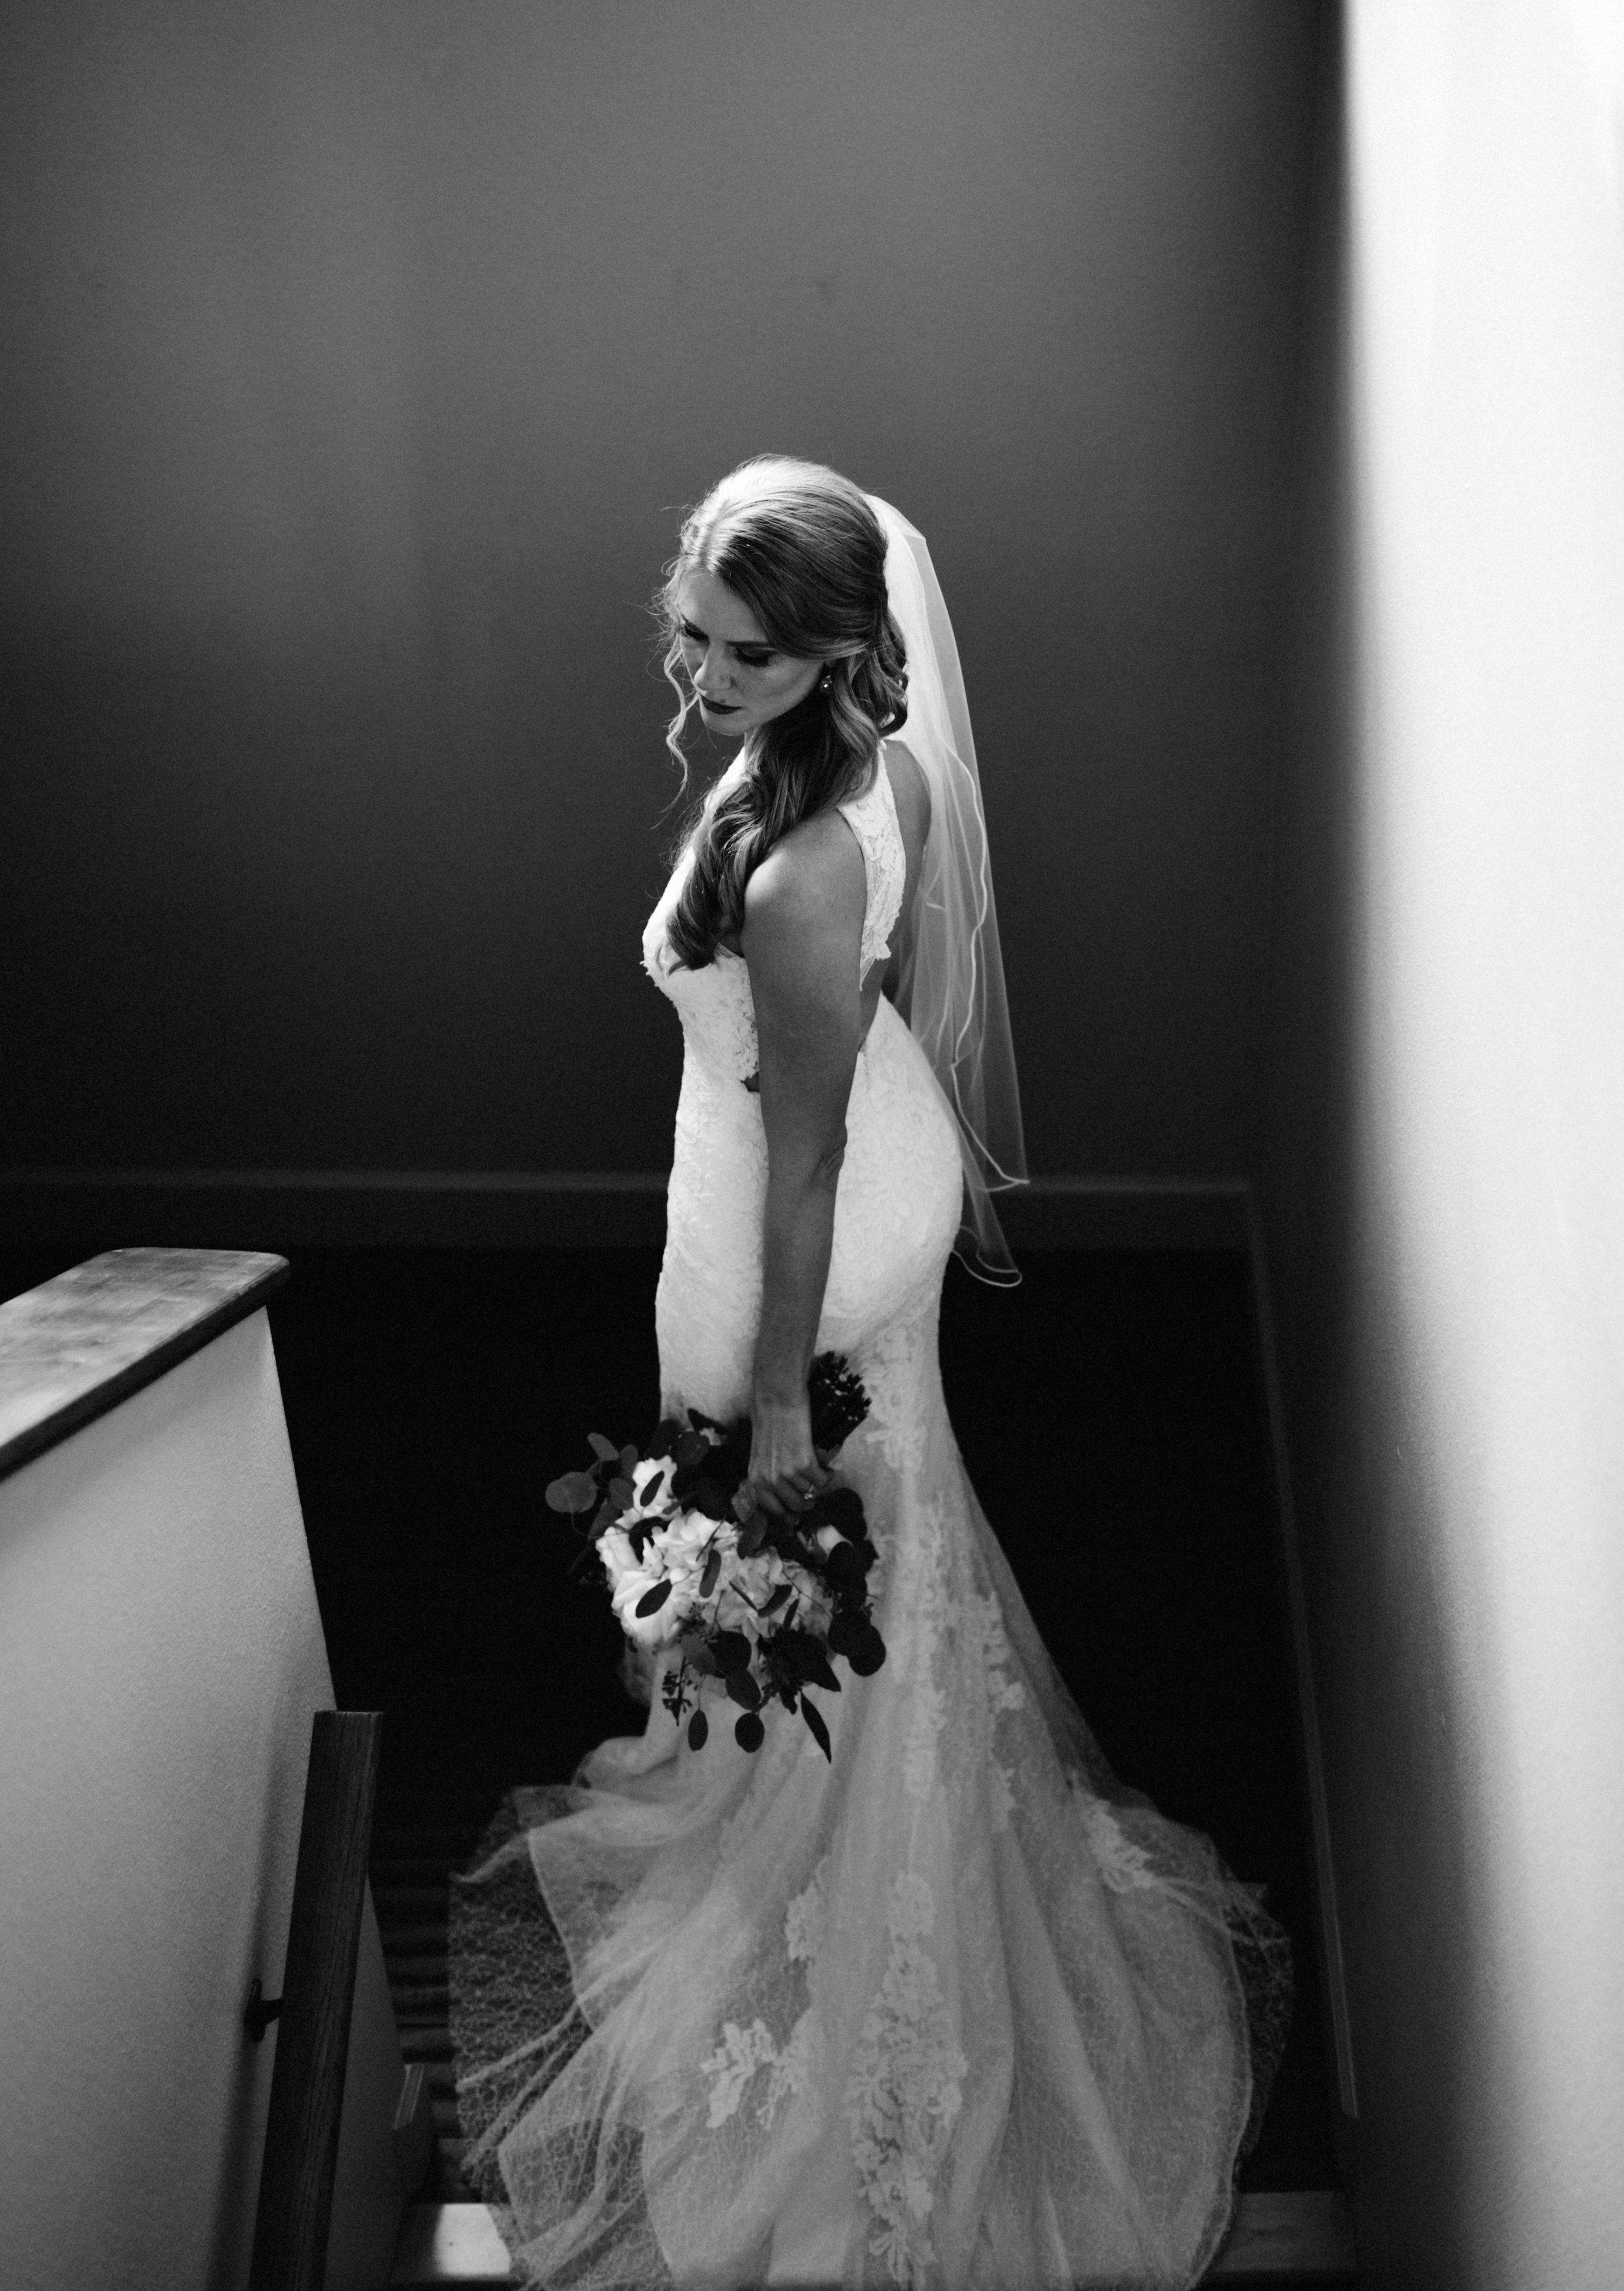 Wedding Day | Vanessa Boy | vanessaboy.com-441.com .jpg